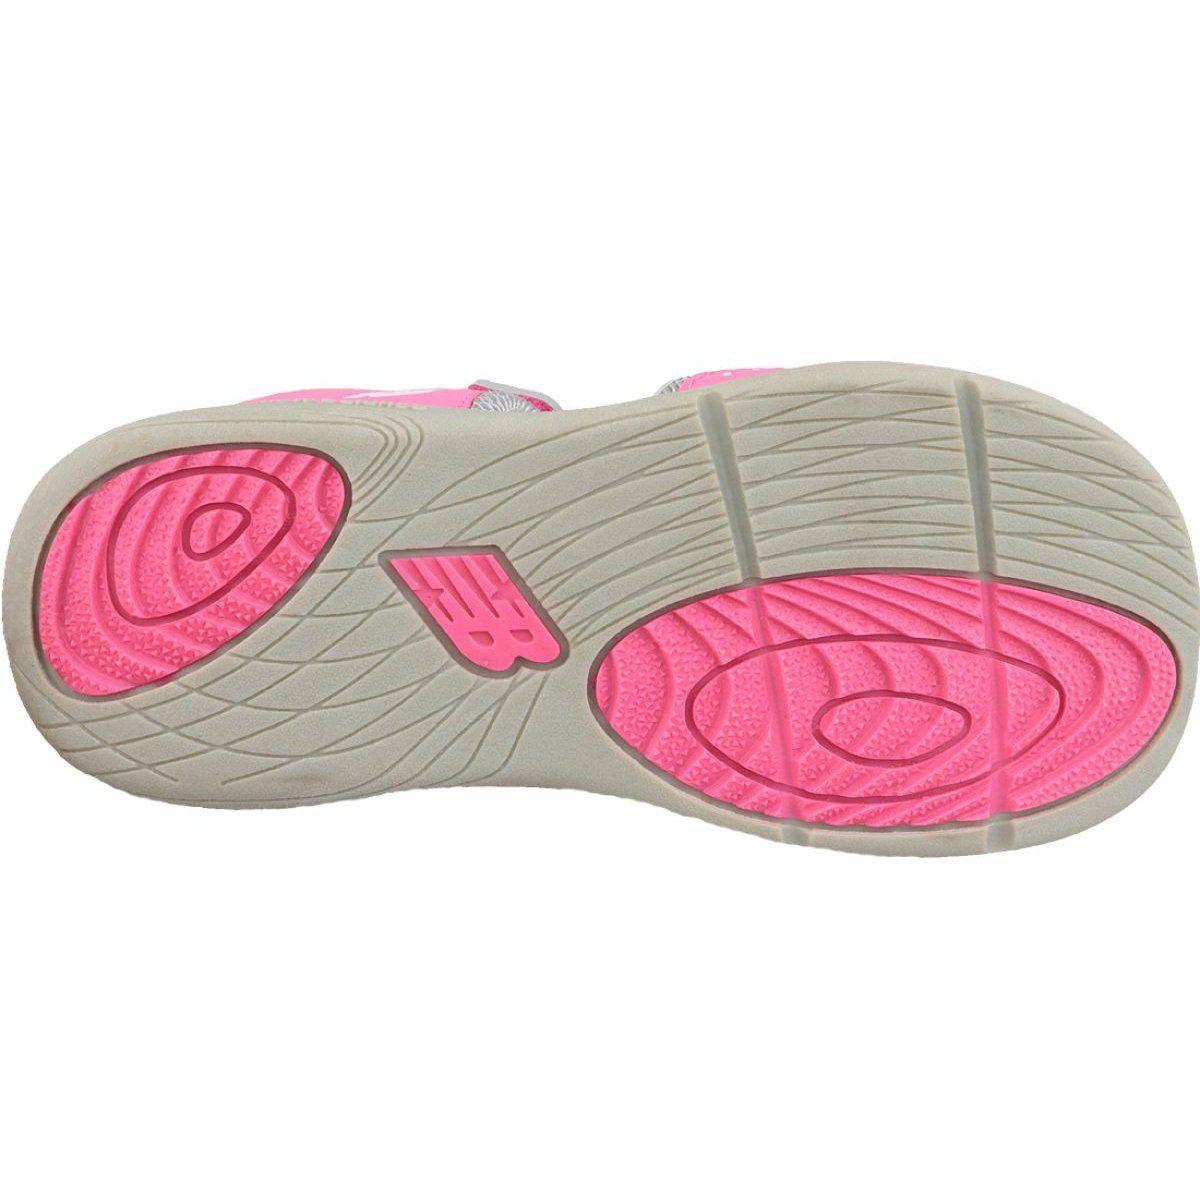 Sandaly New Balance Sandal K K2004grp Rozowe New Balance Sandals New Balance Sport Sandals